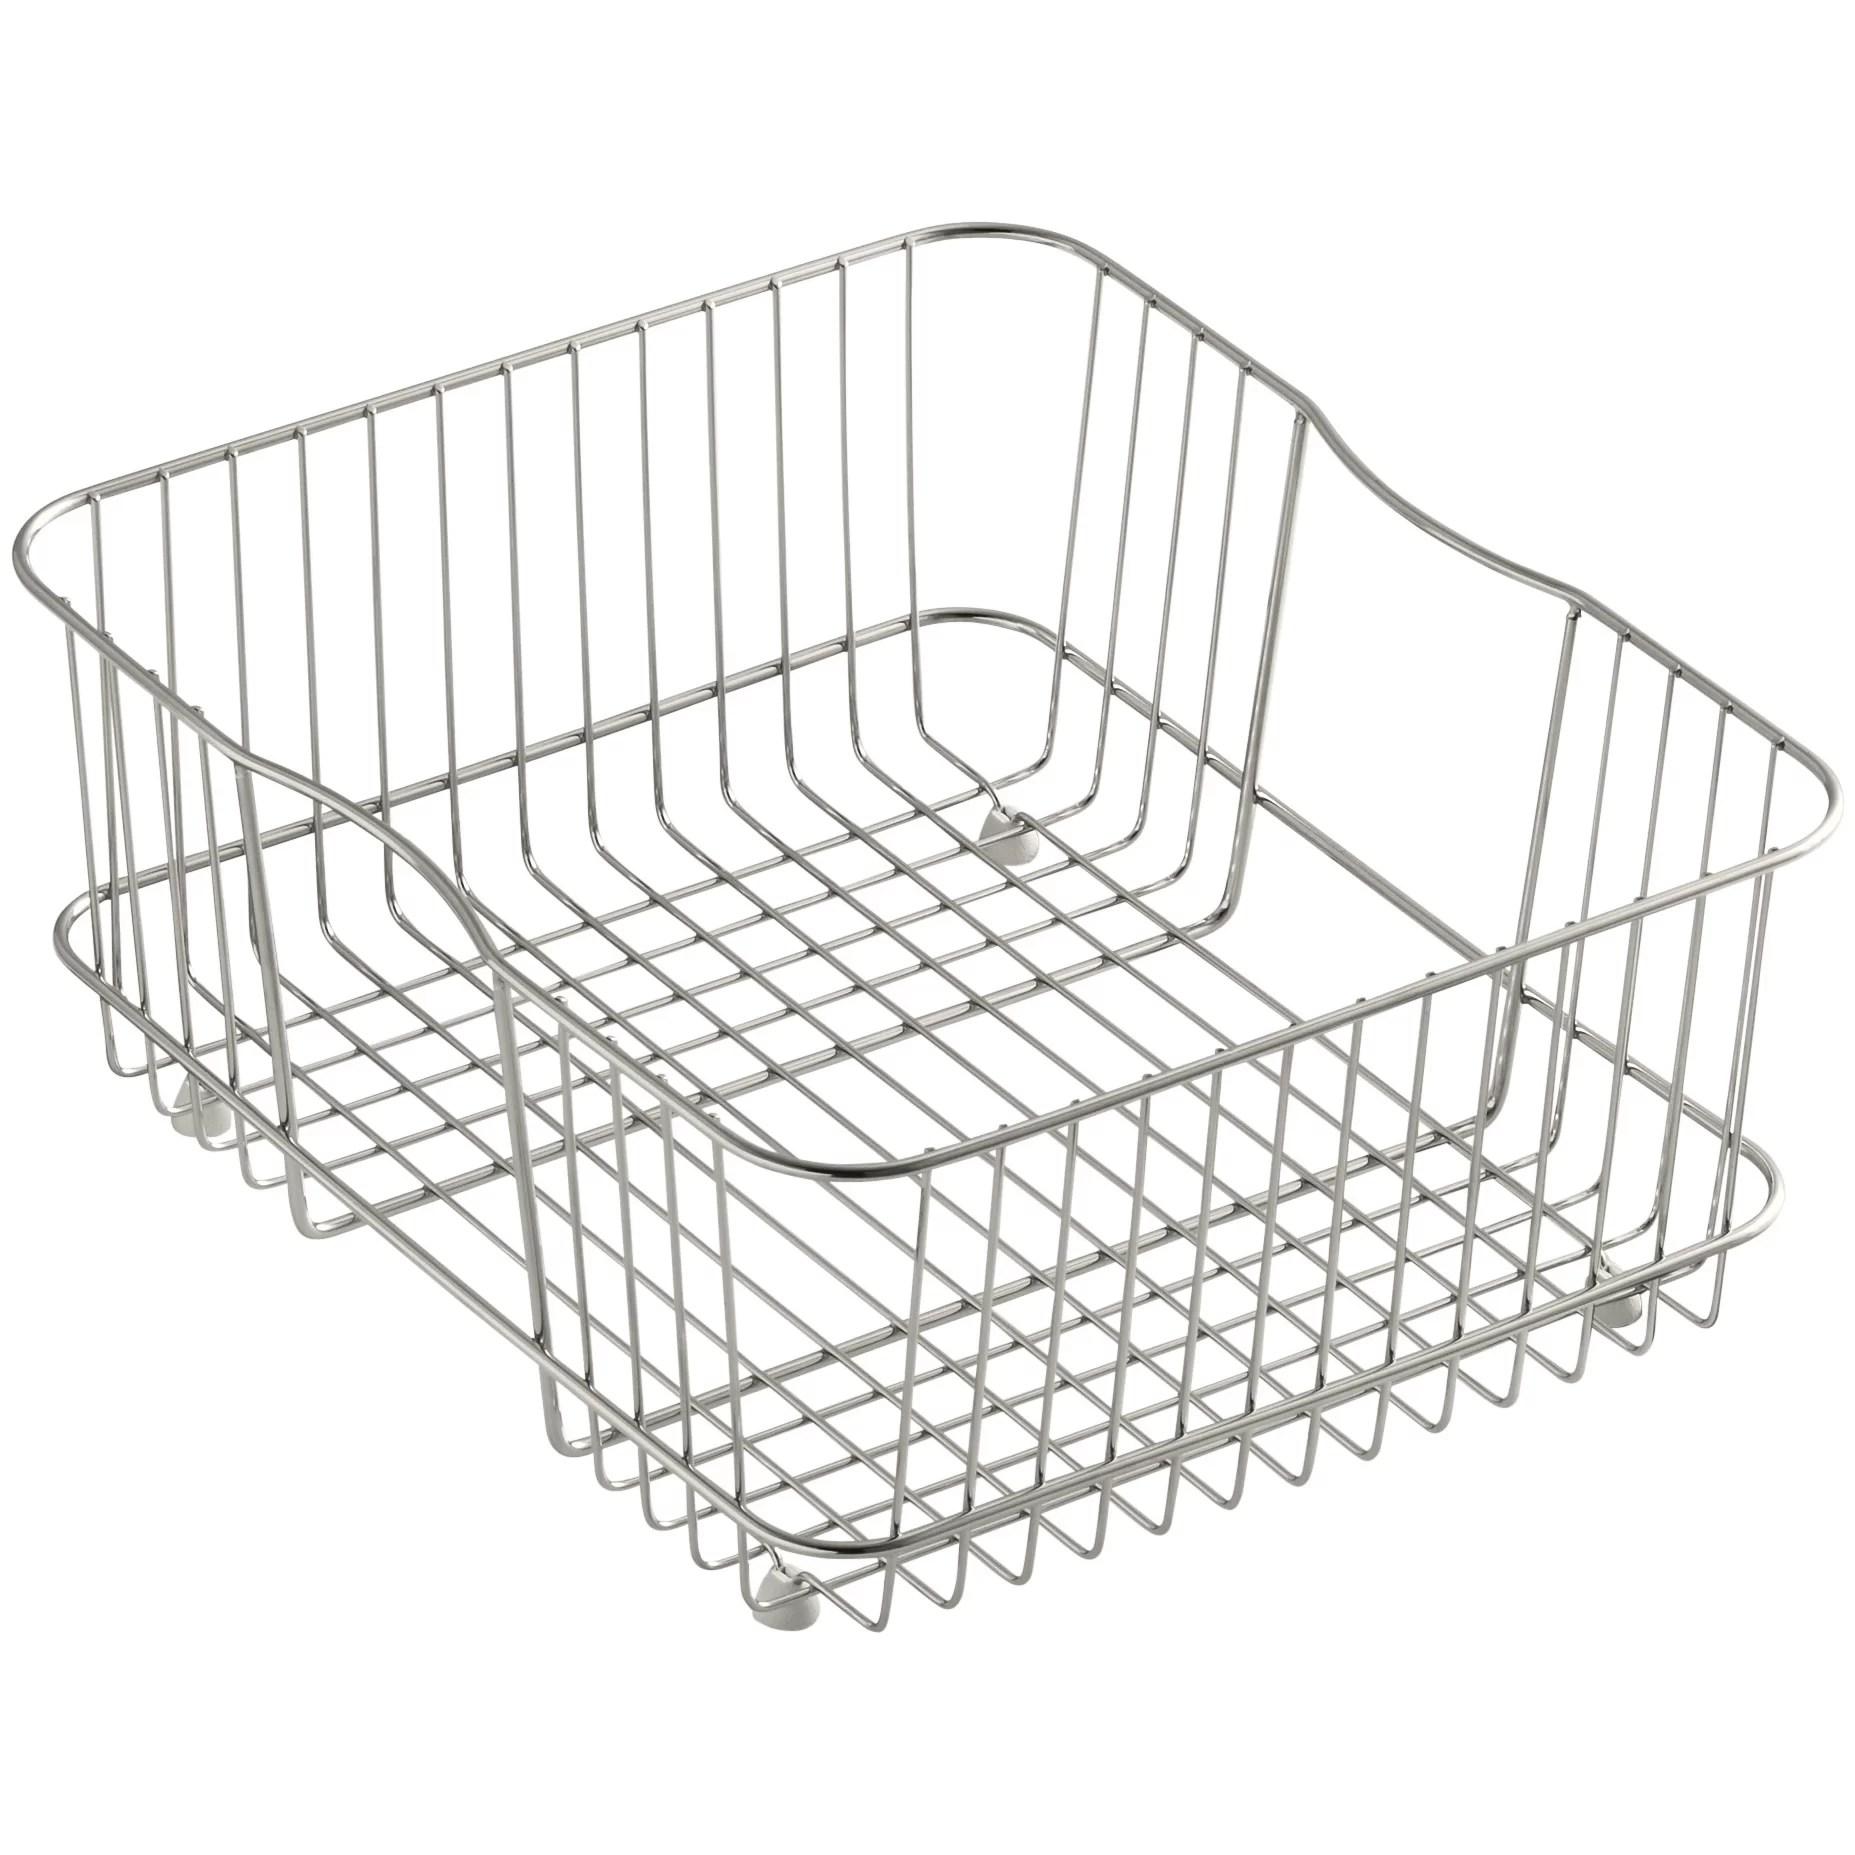 Kohler Coated Sink Basket for Undertone and Iron/Tones